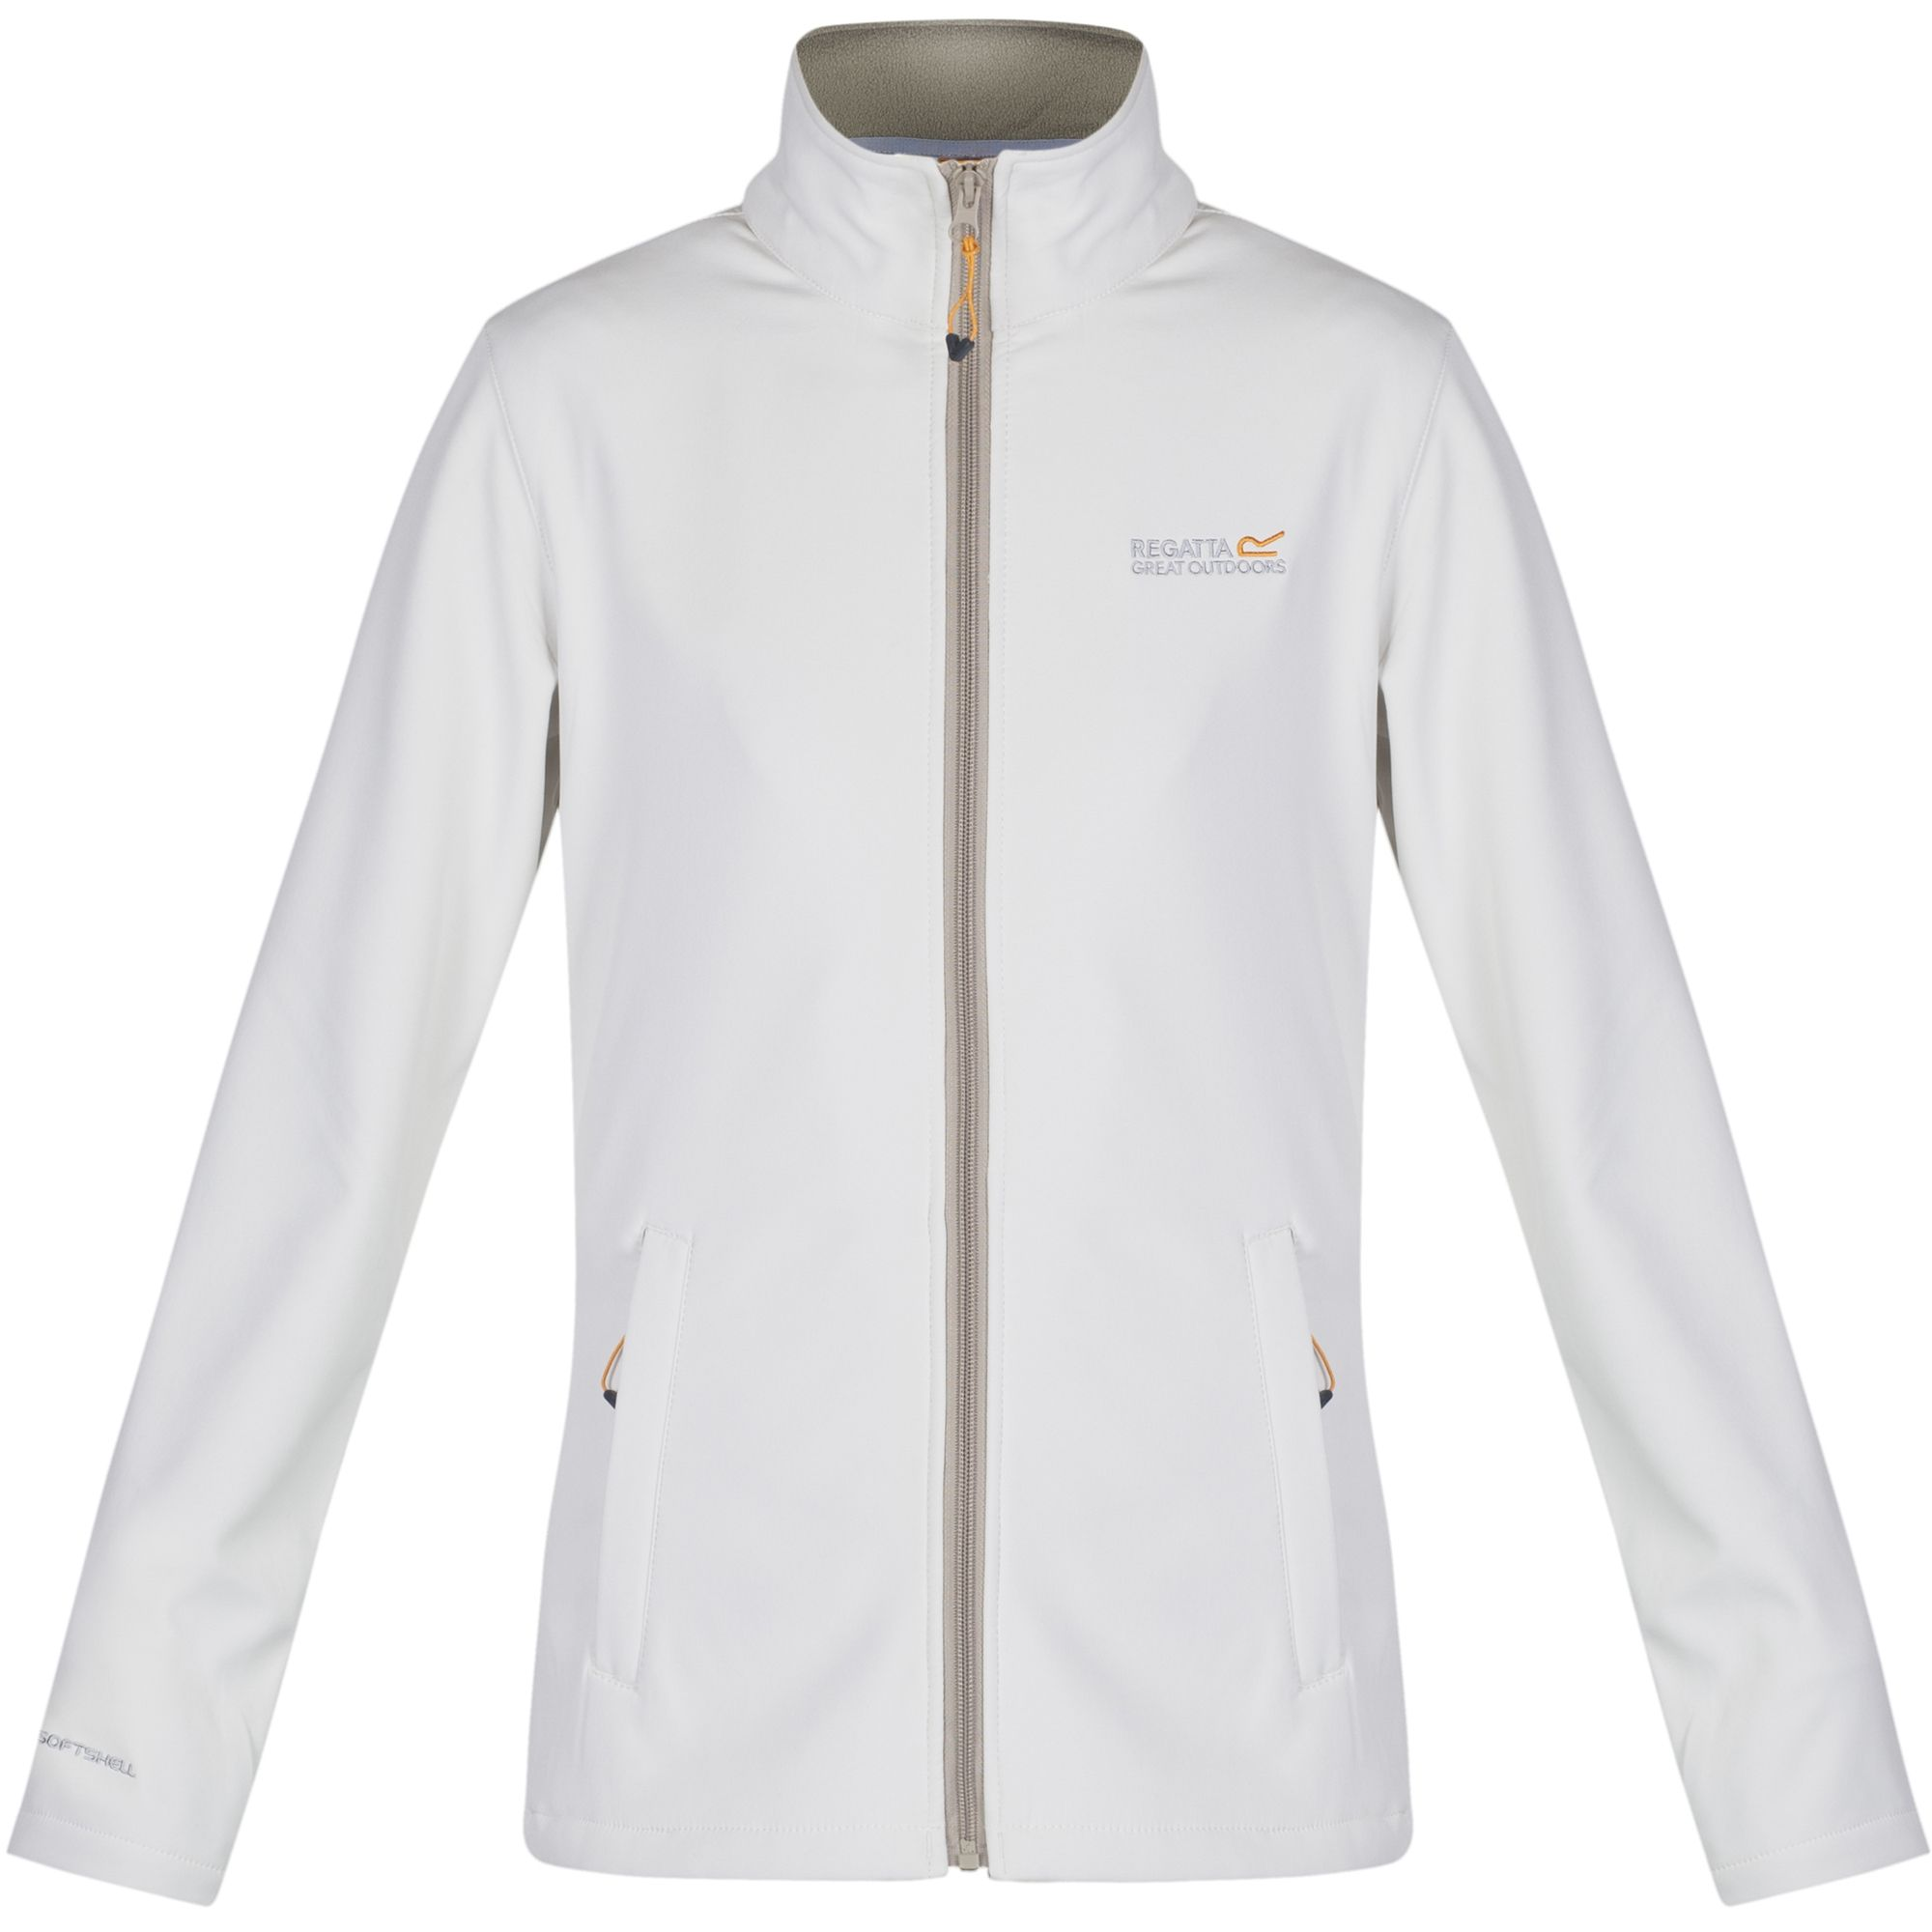 Regatta Great Outdoors Womens/Ladies Connie III Full Zip Softshell Jacket